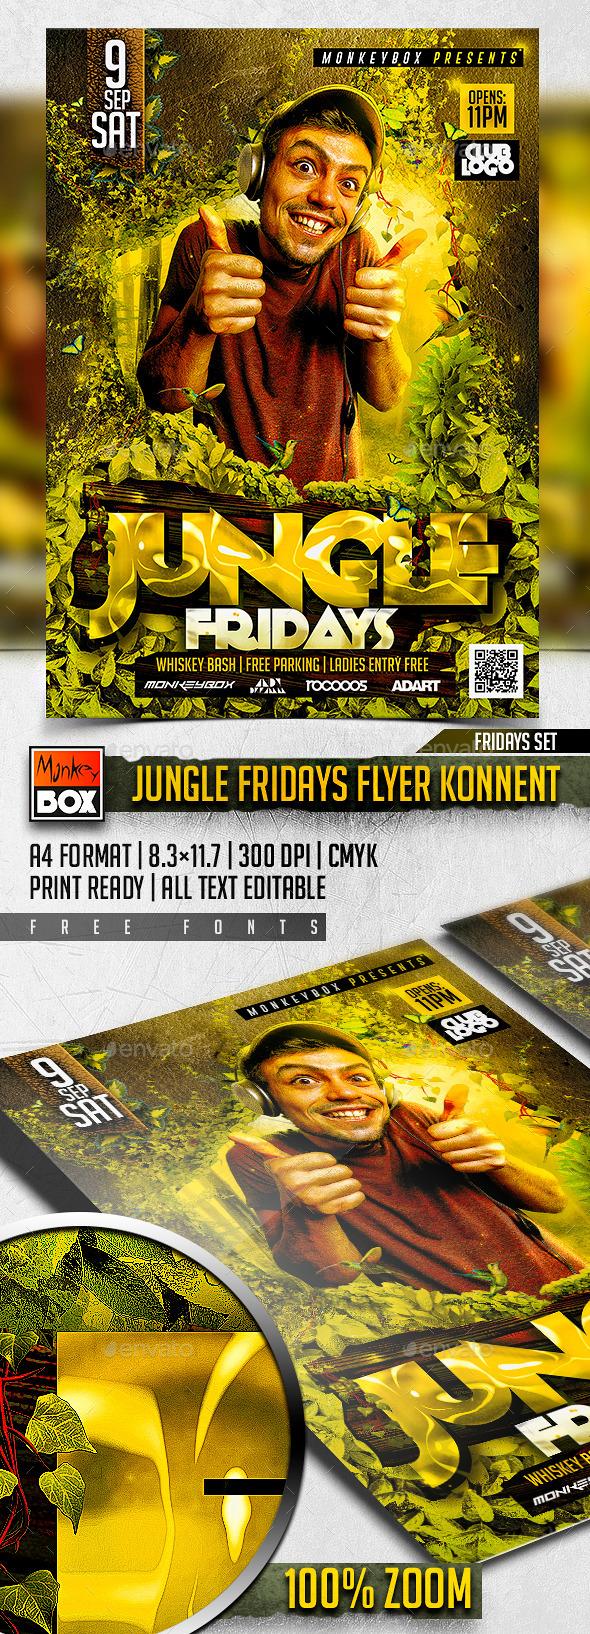 Jungle Fridays Flyer Konnekt